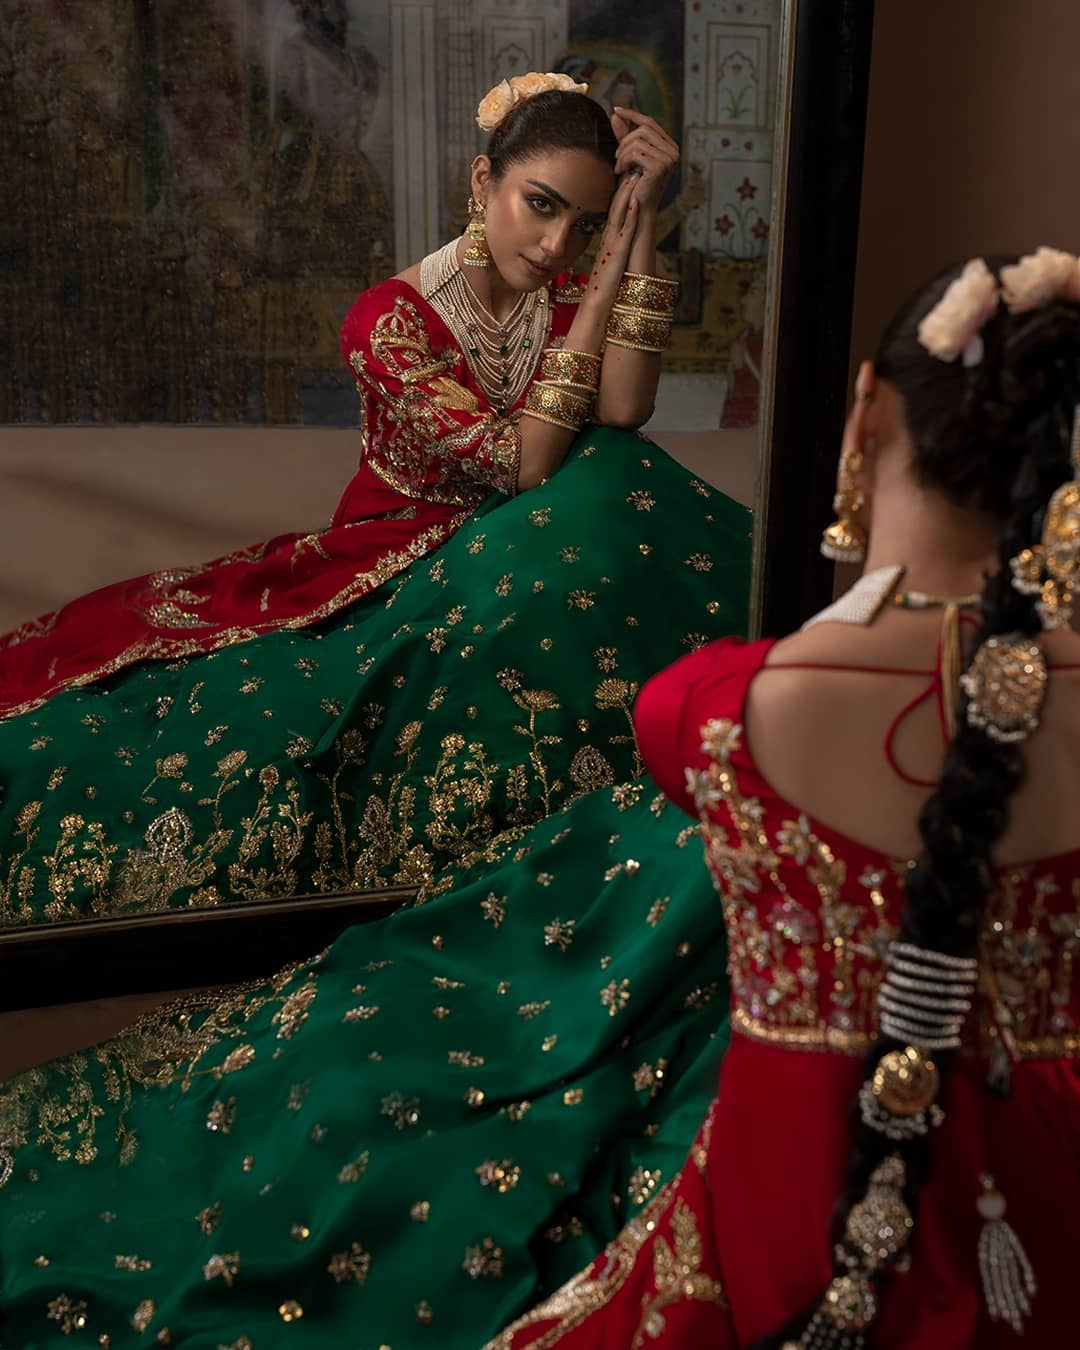 Maya Ali is Looking Gorgeous in Bridal Shoot for Ali Xeeshan